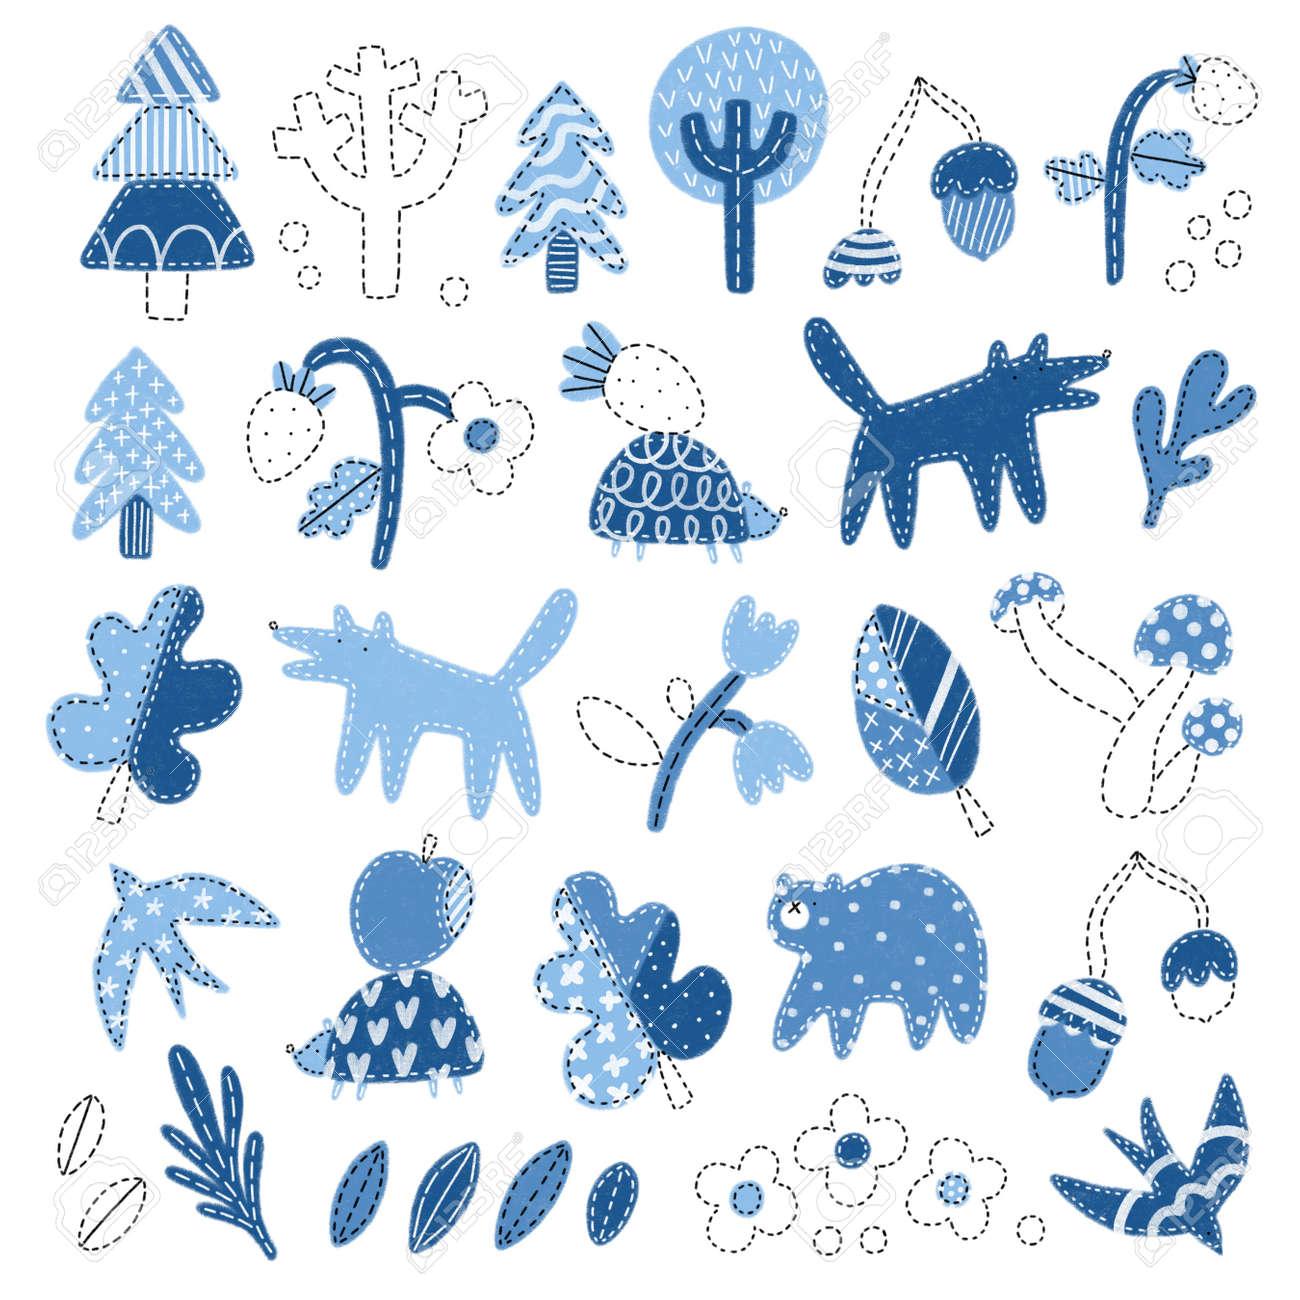 Patchwork denim woodland illustrations set, isolated on white background, cute forest nursery doodles - 166198595